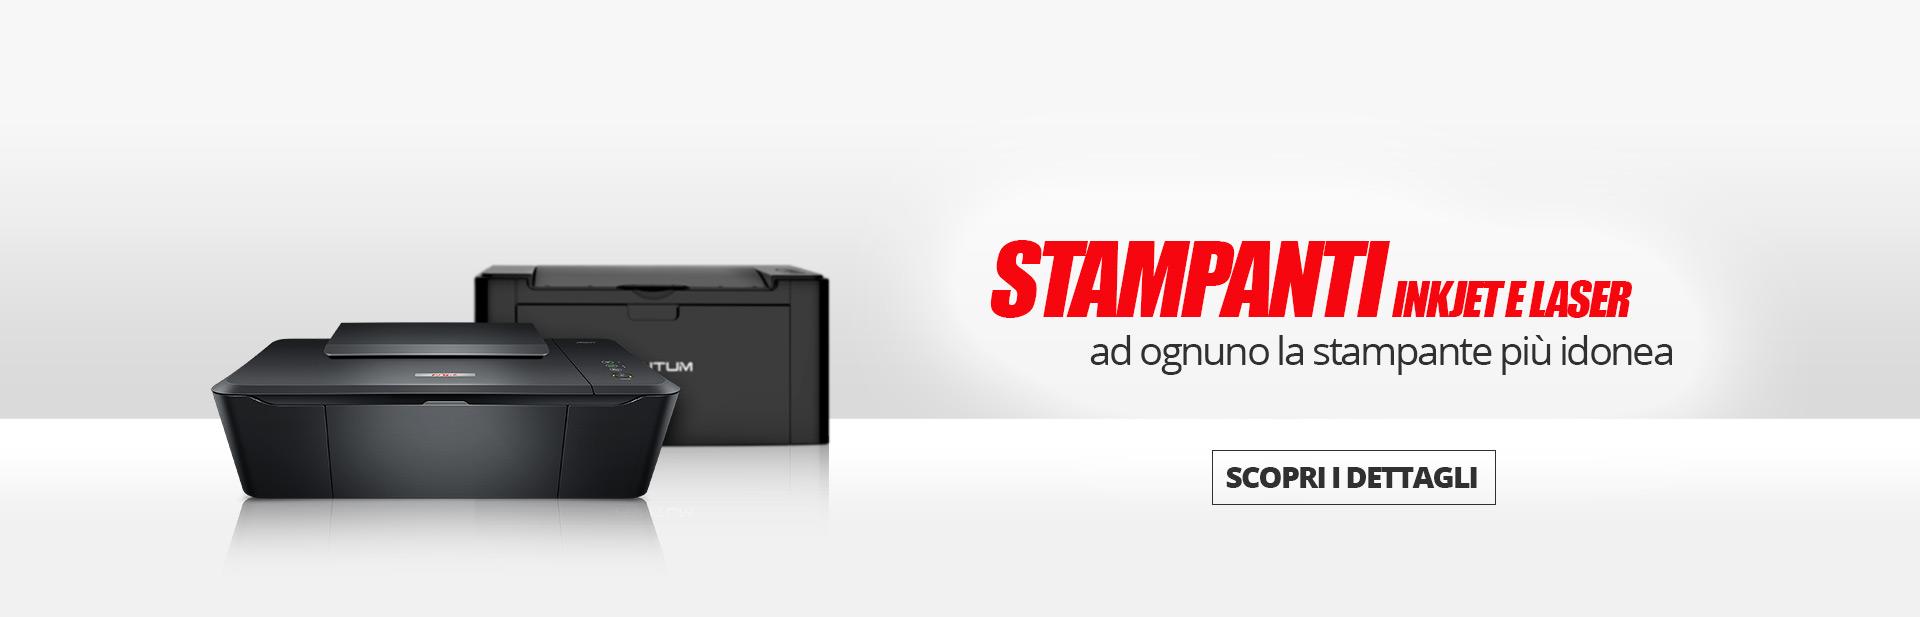 stampanti-inkjet-e-stampanti-laser-nei-negozi-prink-SLIDE